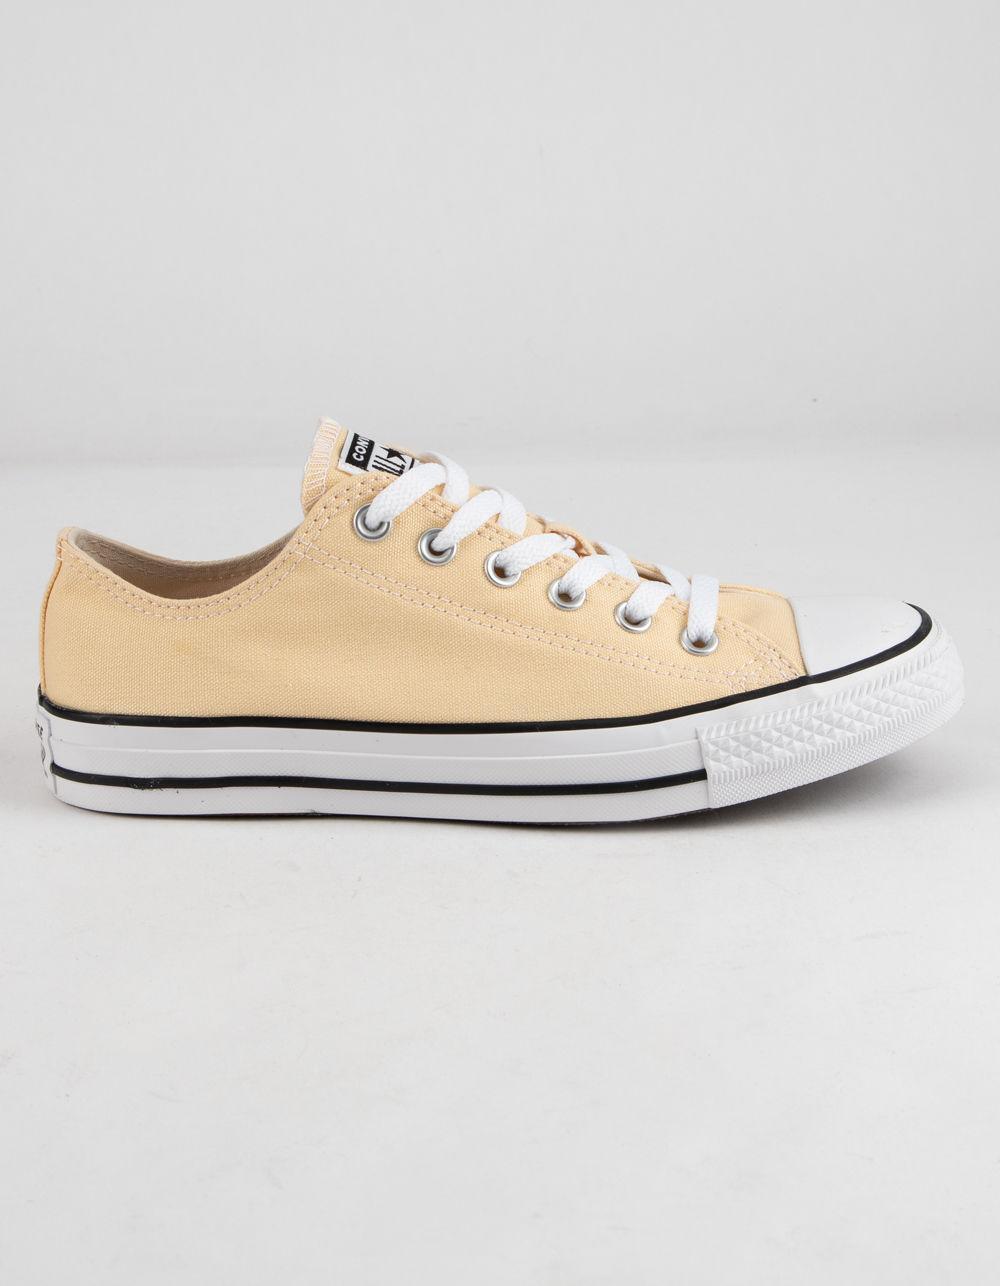 5bd15262bf8eee Lyst - Converse Chuck Taylor All Star Ox Seasonal Pale Vanilla Shoes